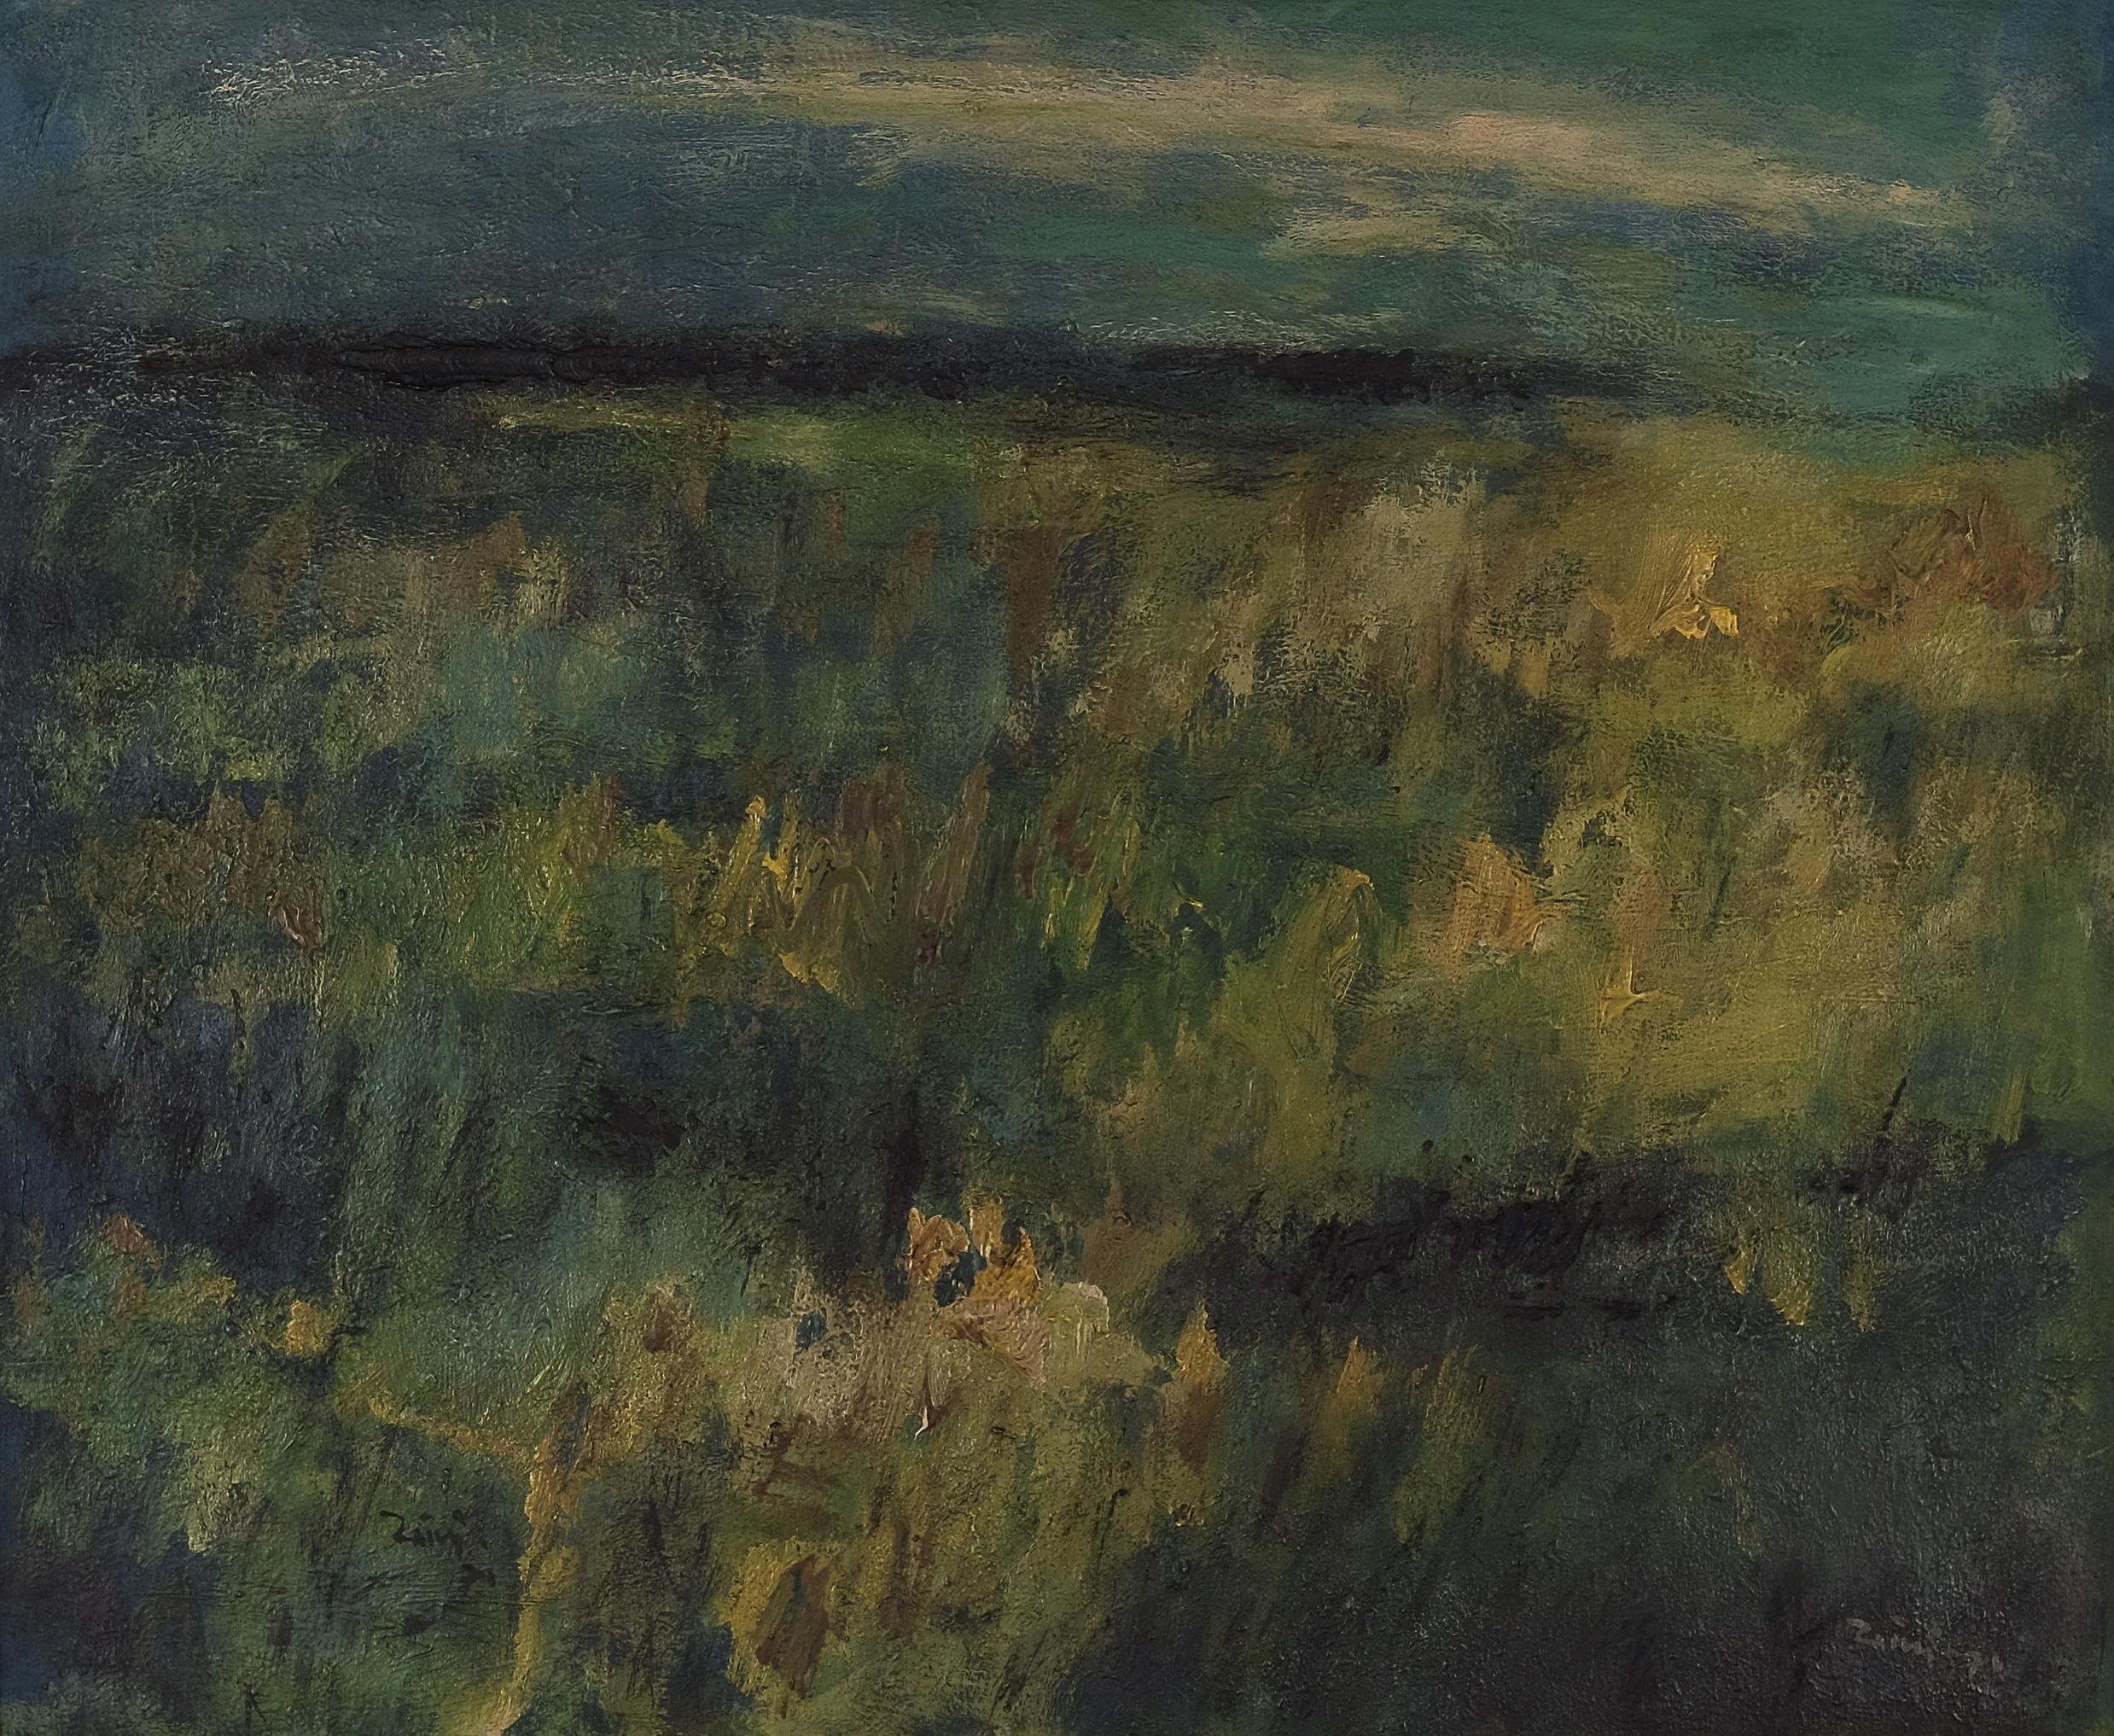 Zaini, Padang Rumput (Open Field), ooc, 50.5 x 60.jpg